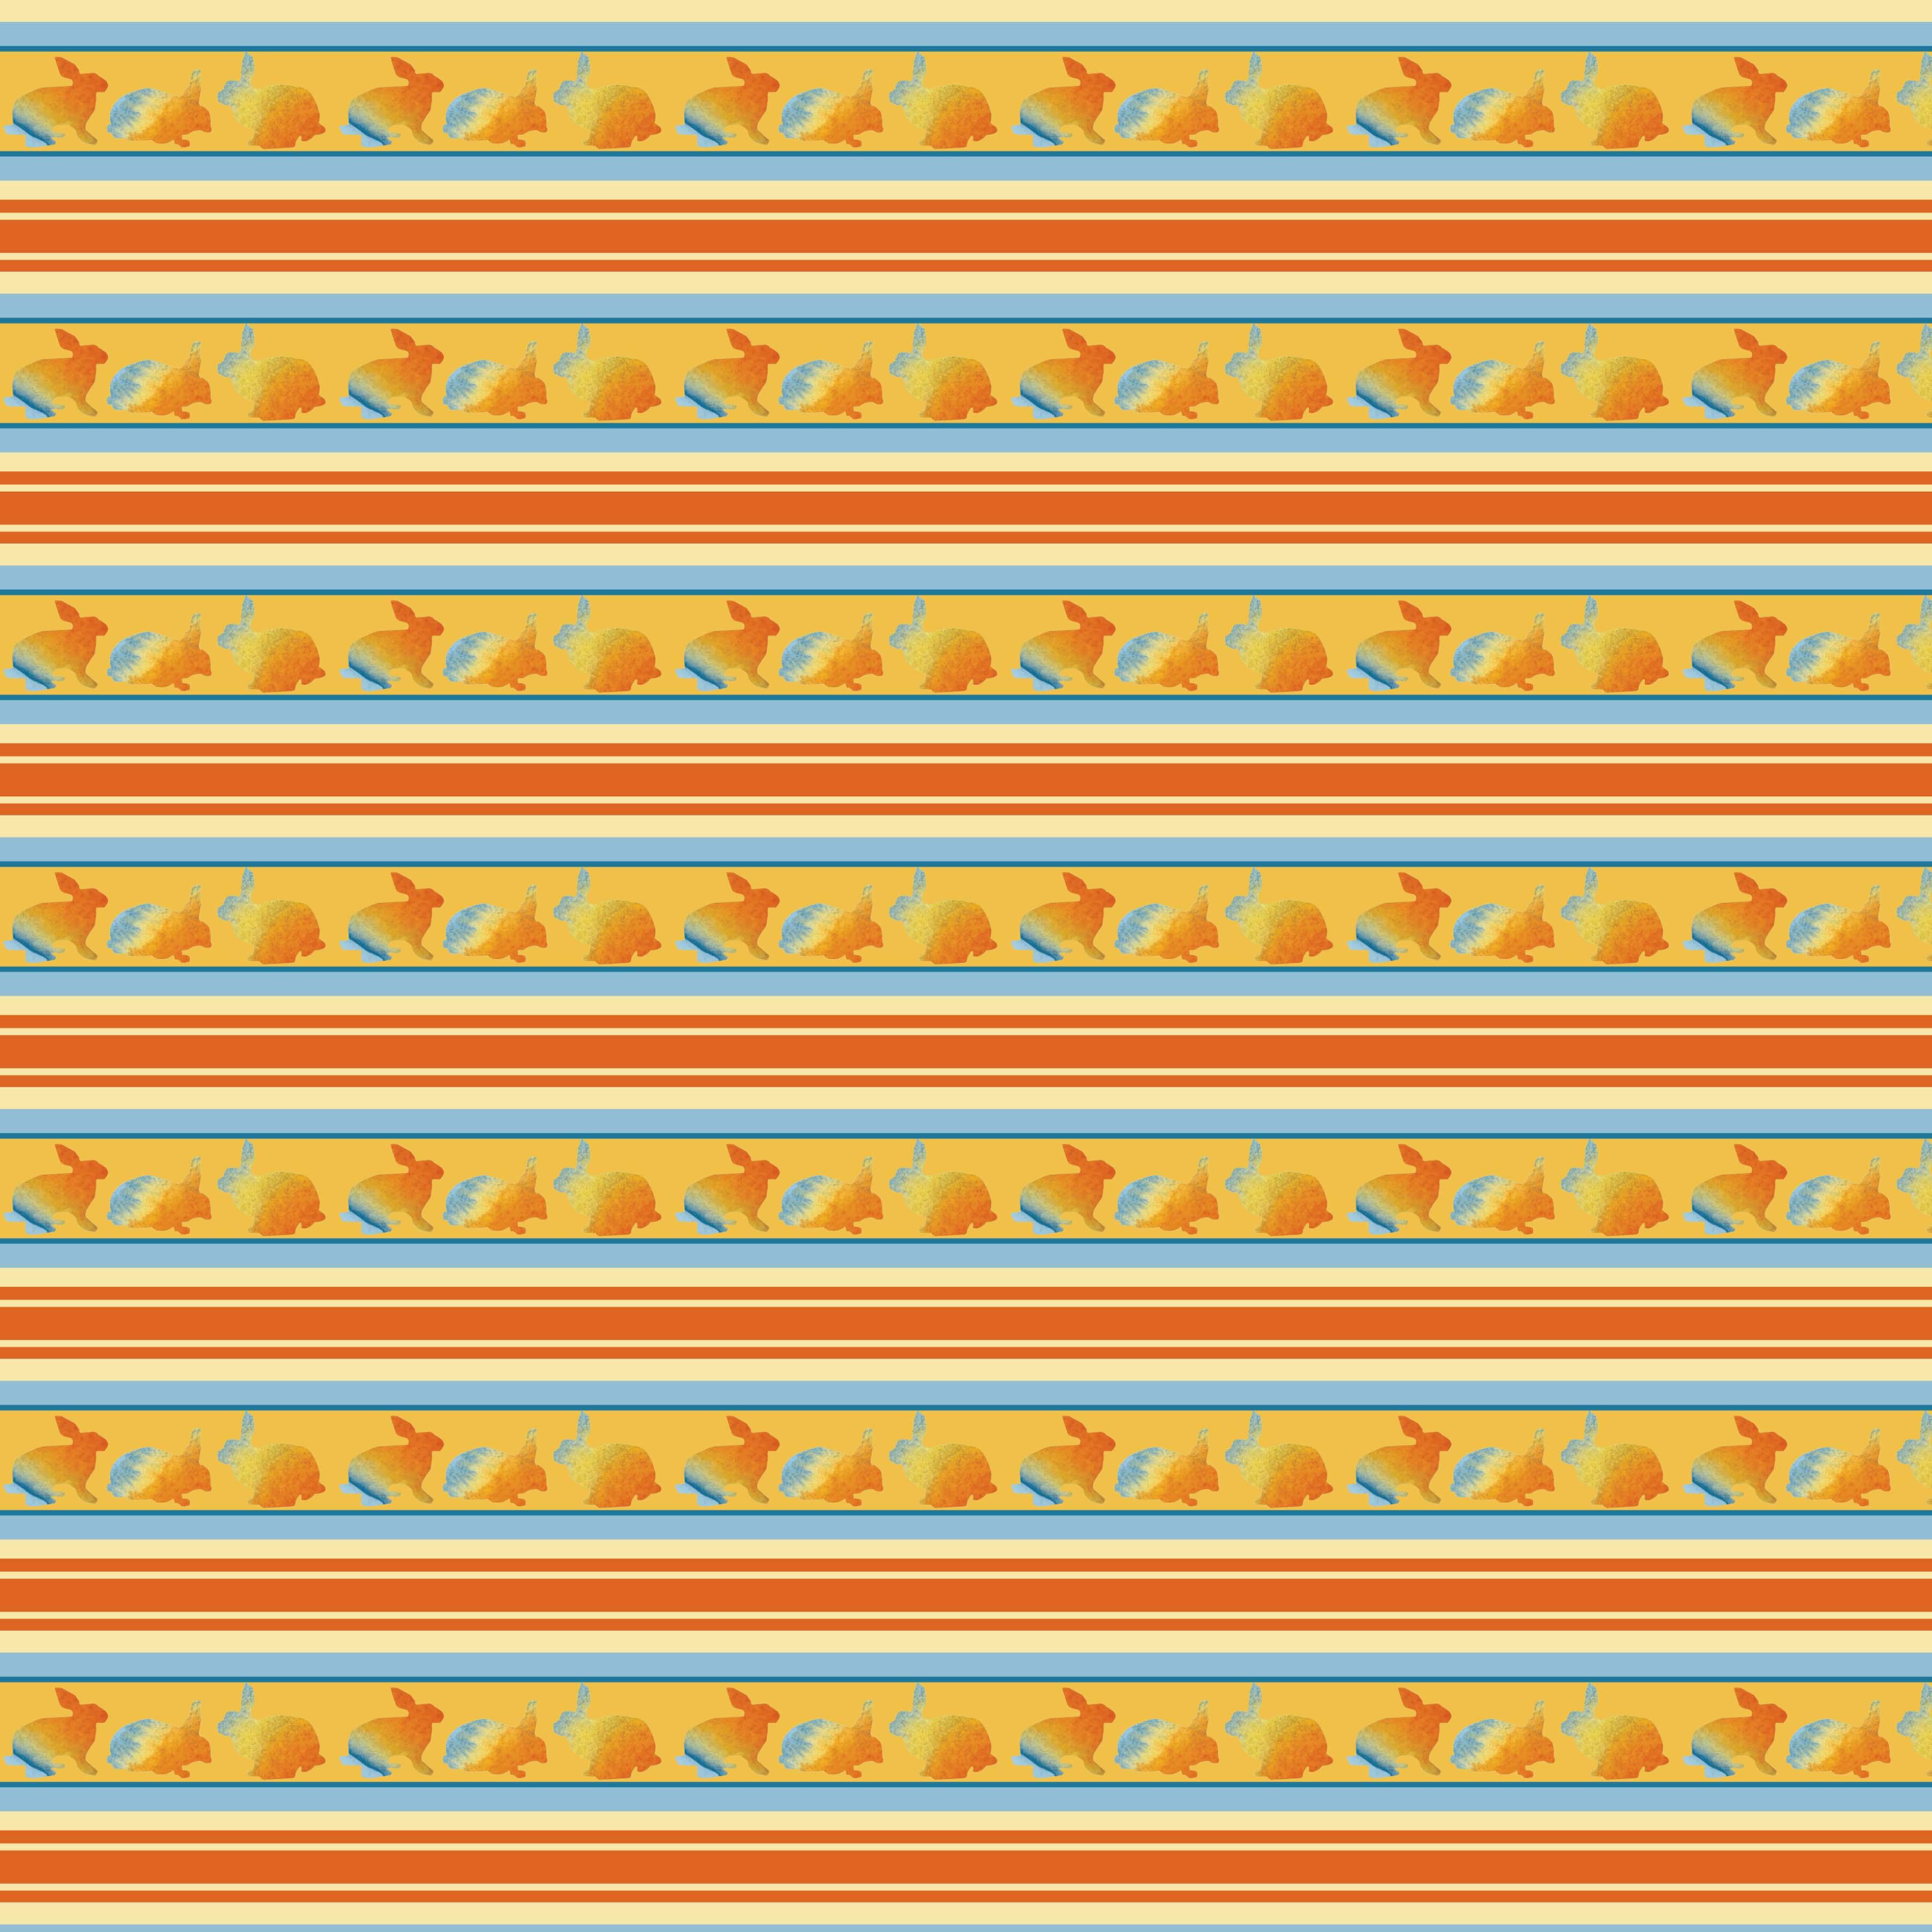 bunny stripes